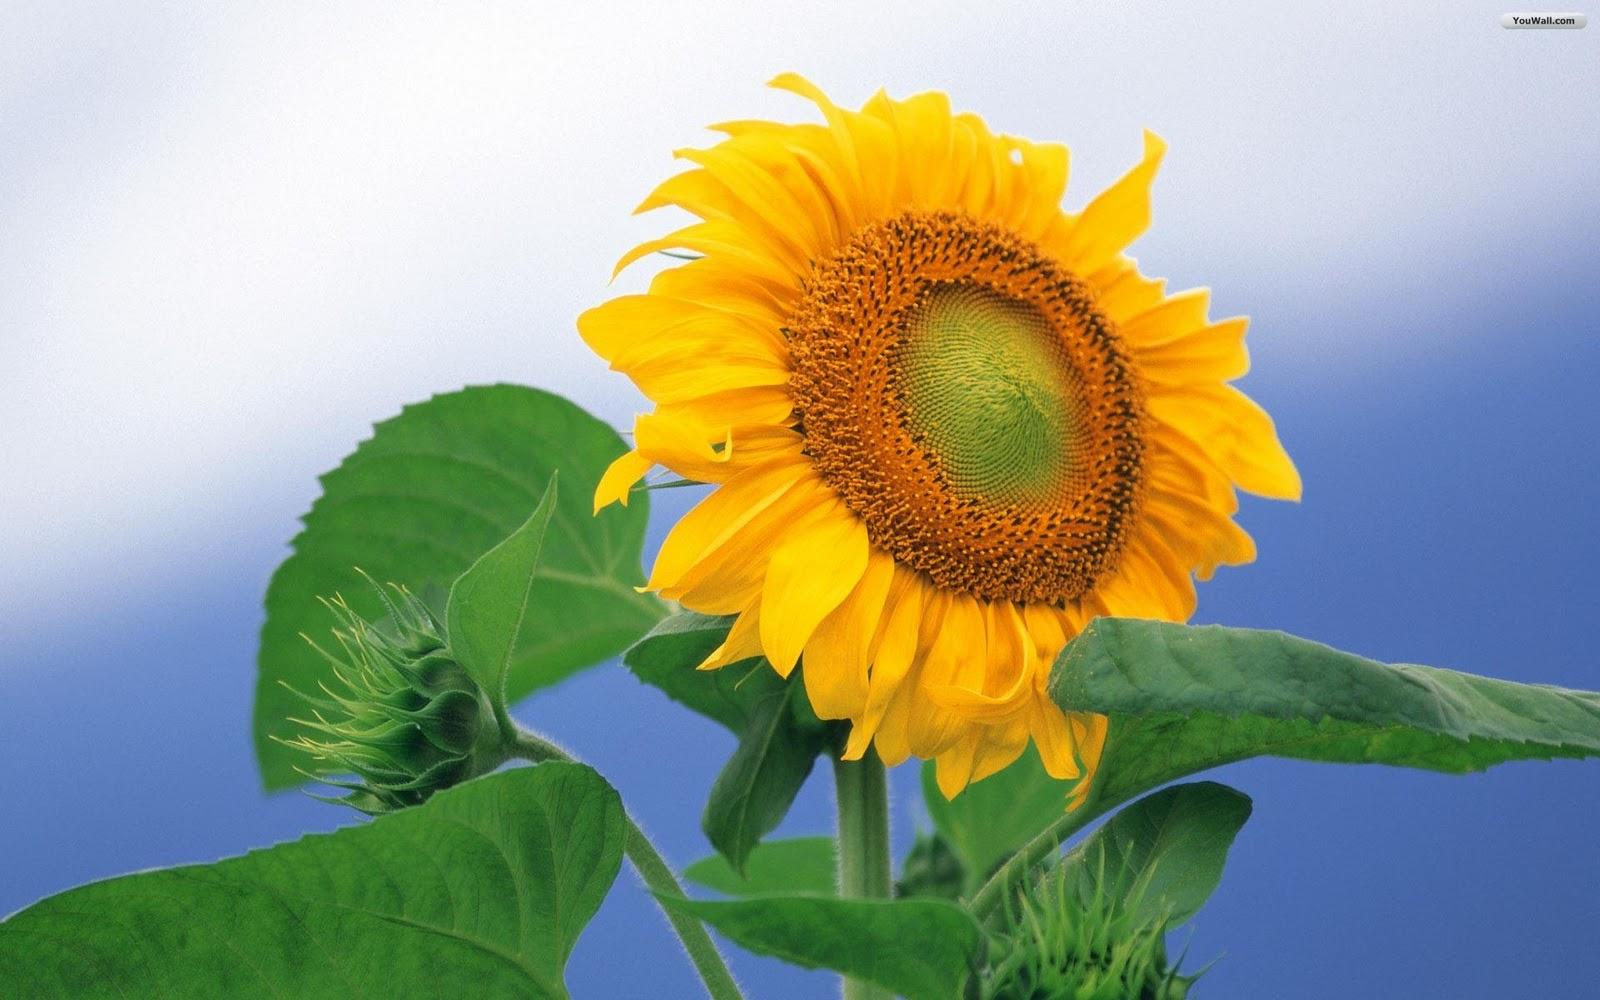 http://2.bp.blogspot.com/_UdUDH_BCTj4/TMyS3YVpatI/AAAAAAAAAGE/vDDOVPjvZaI/s1600/sunflower_wallpaper_9953e.jpg